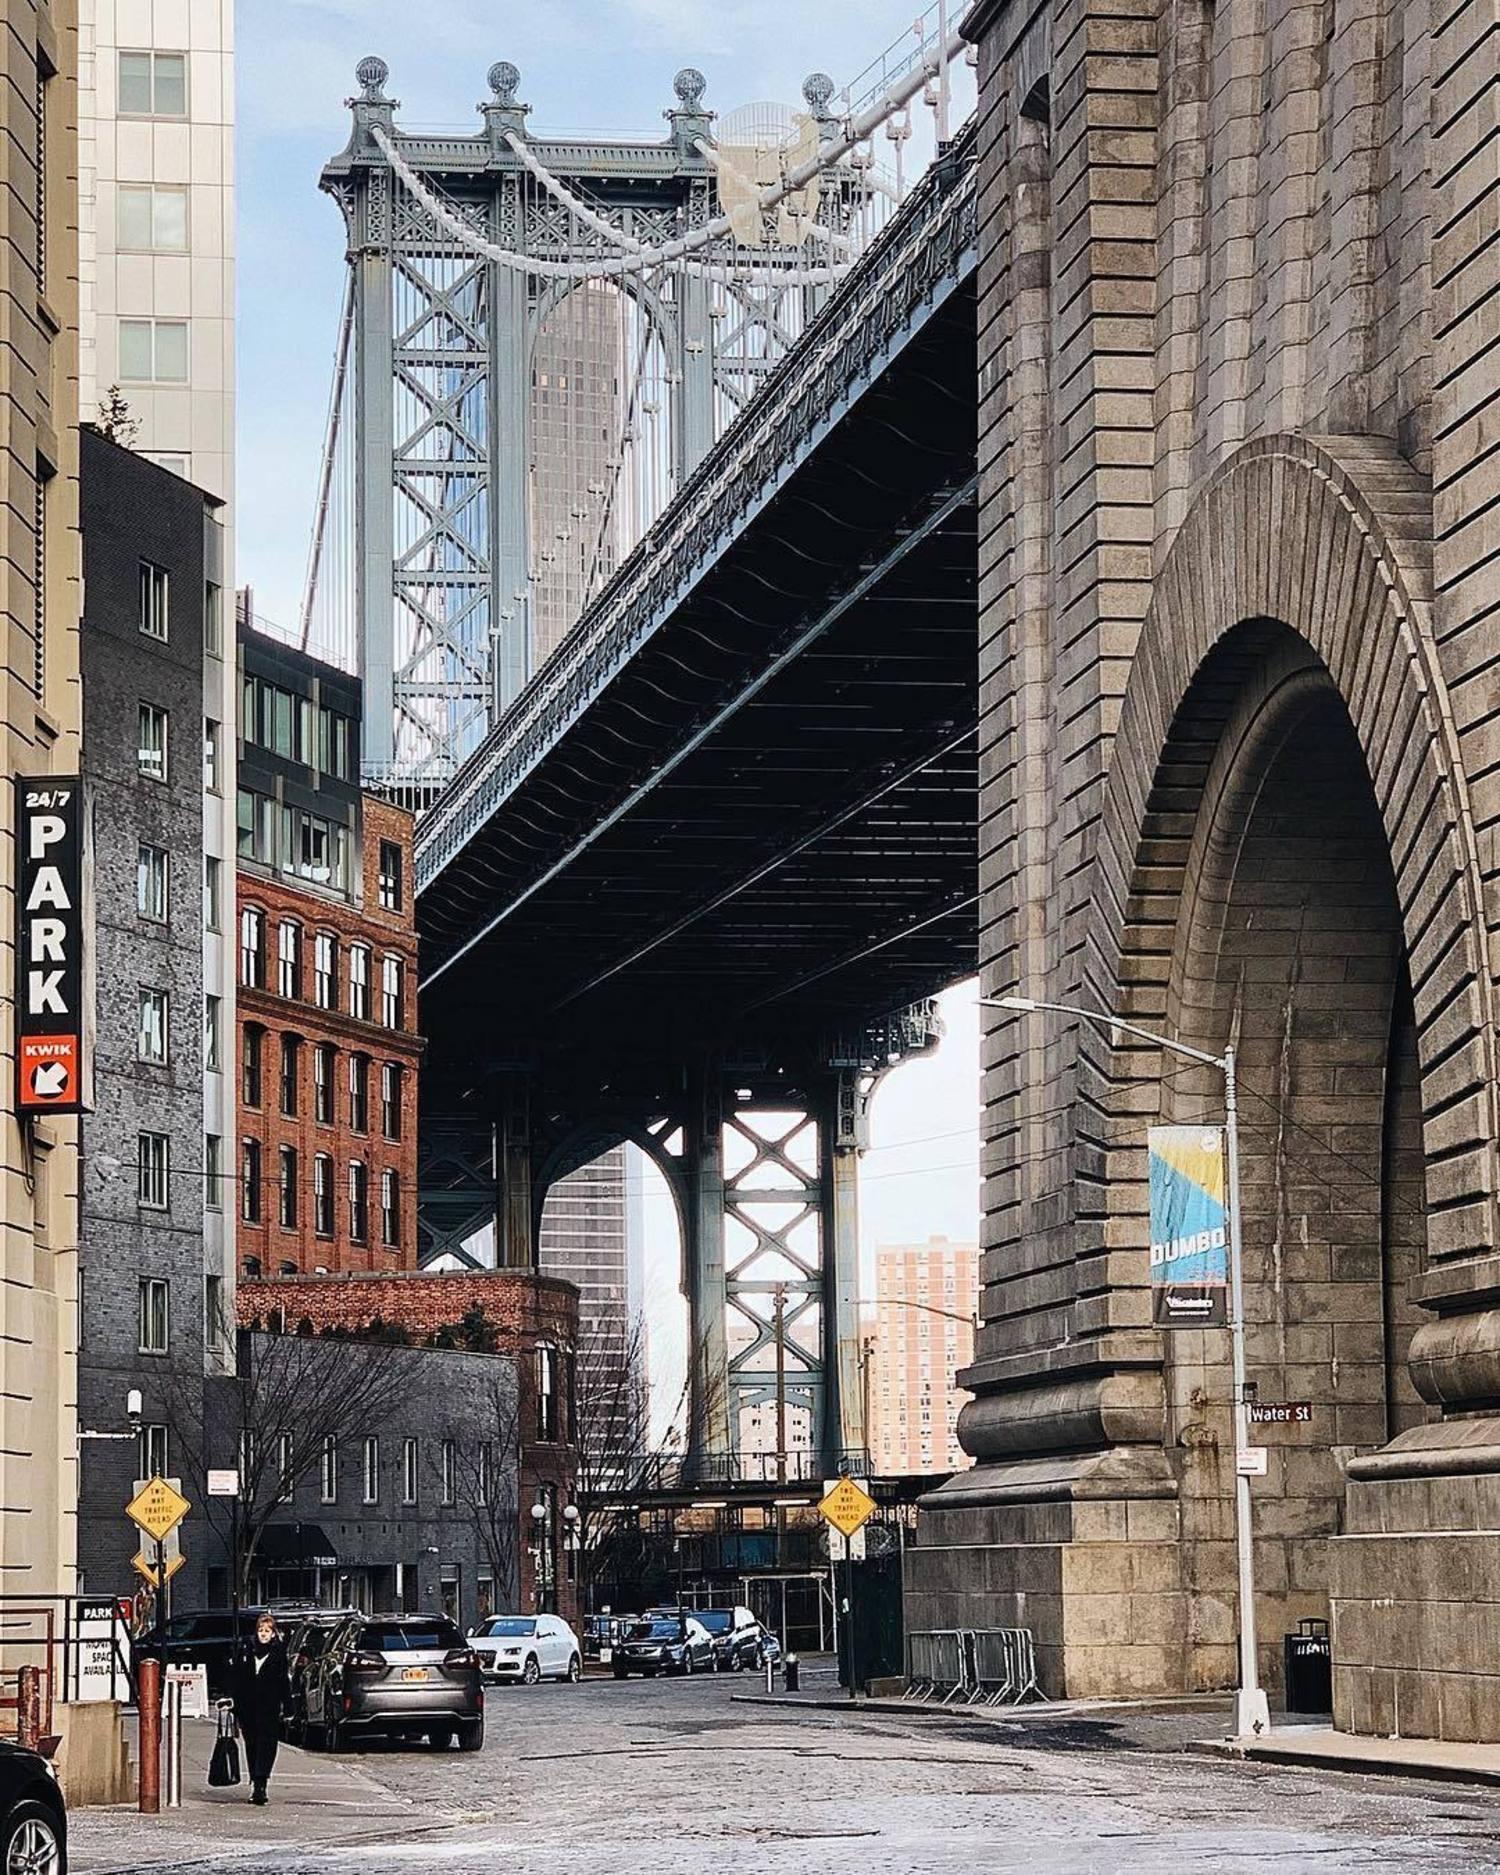 Dumbo, Brooklyn. Photo via @melliekr #viewingnyc #nyc #newyork #newyorkcity #manhattanbridge #dumbo